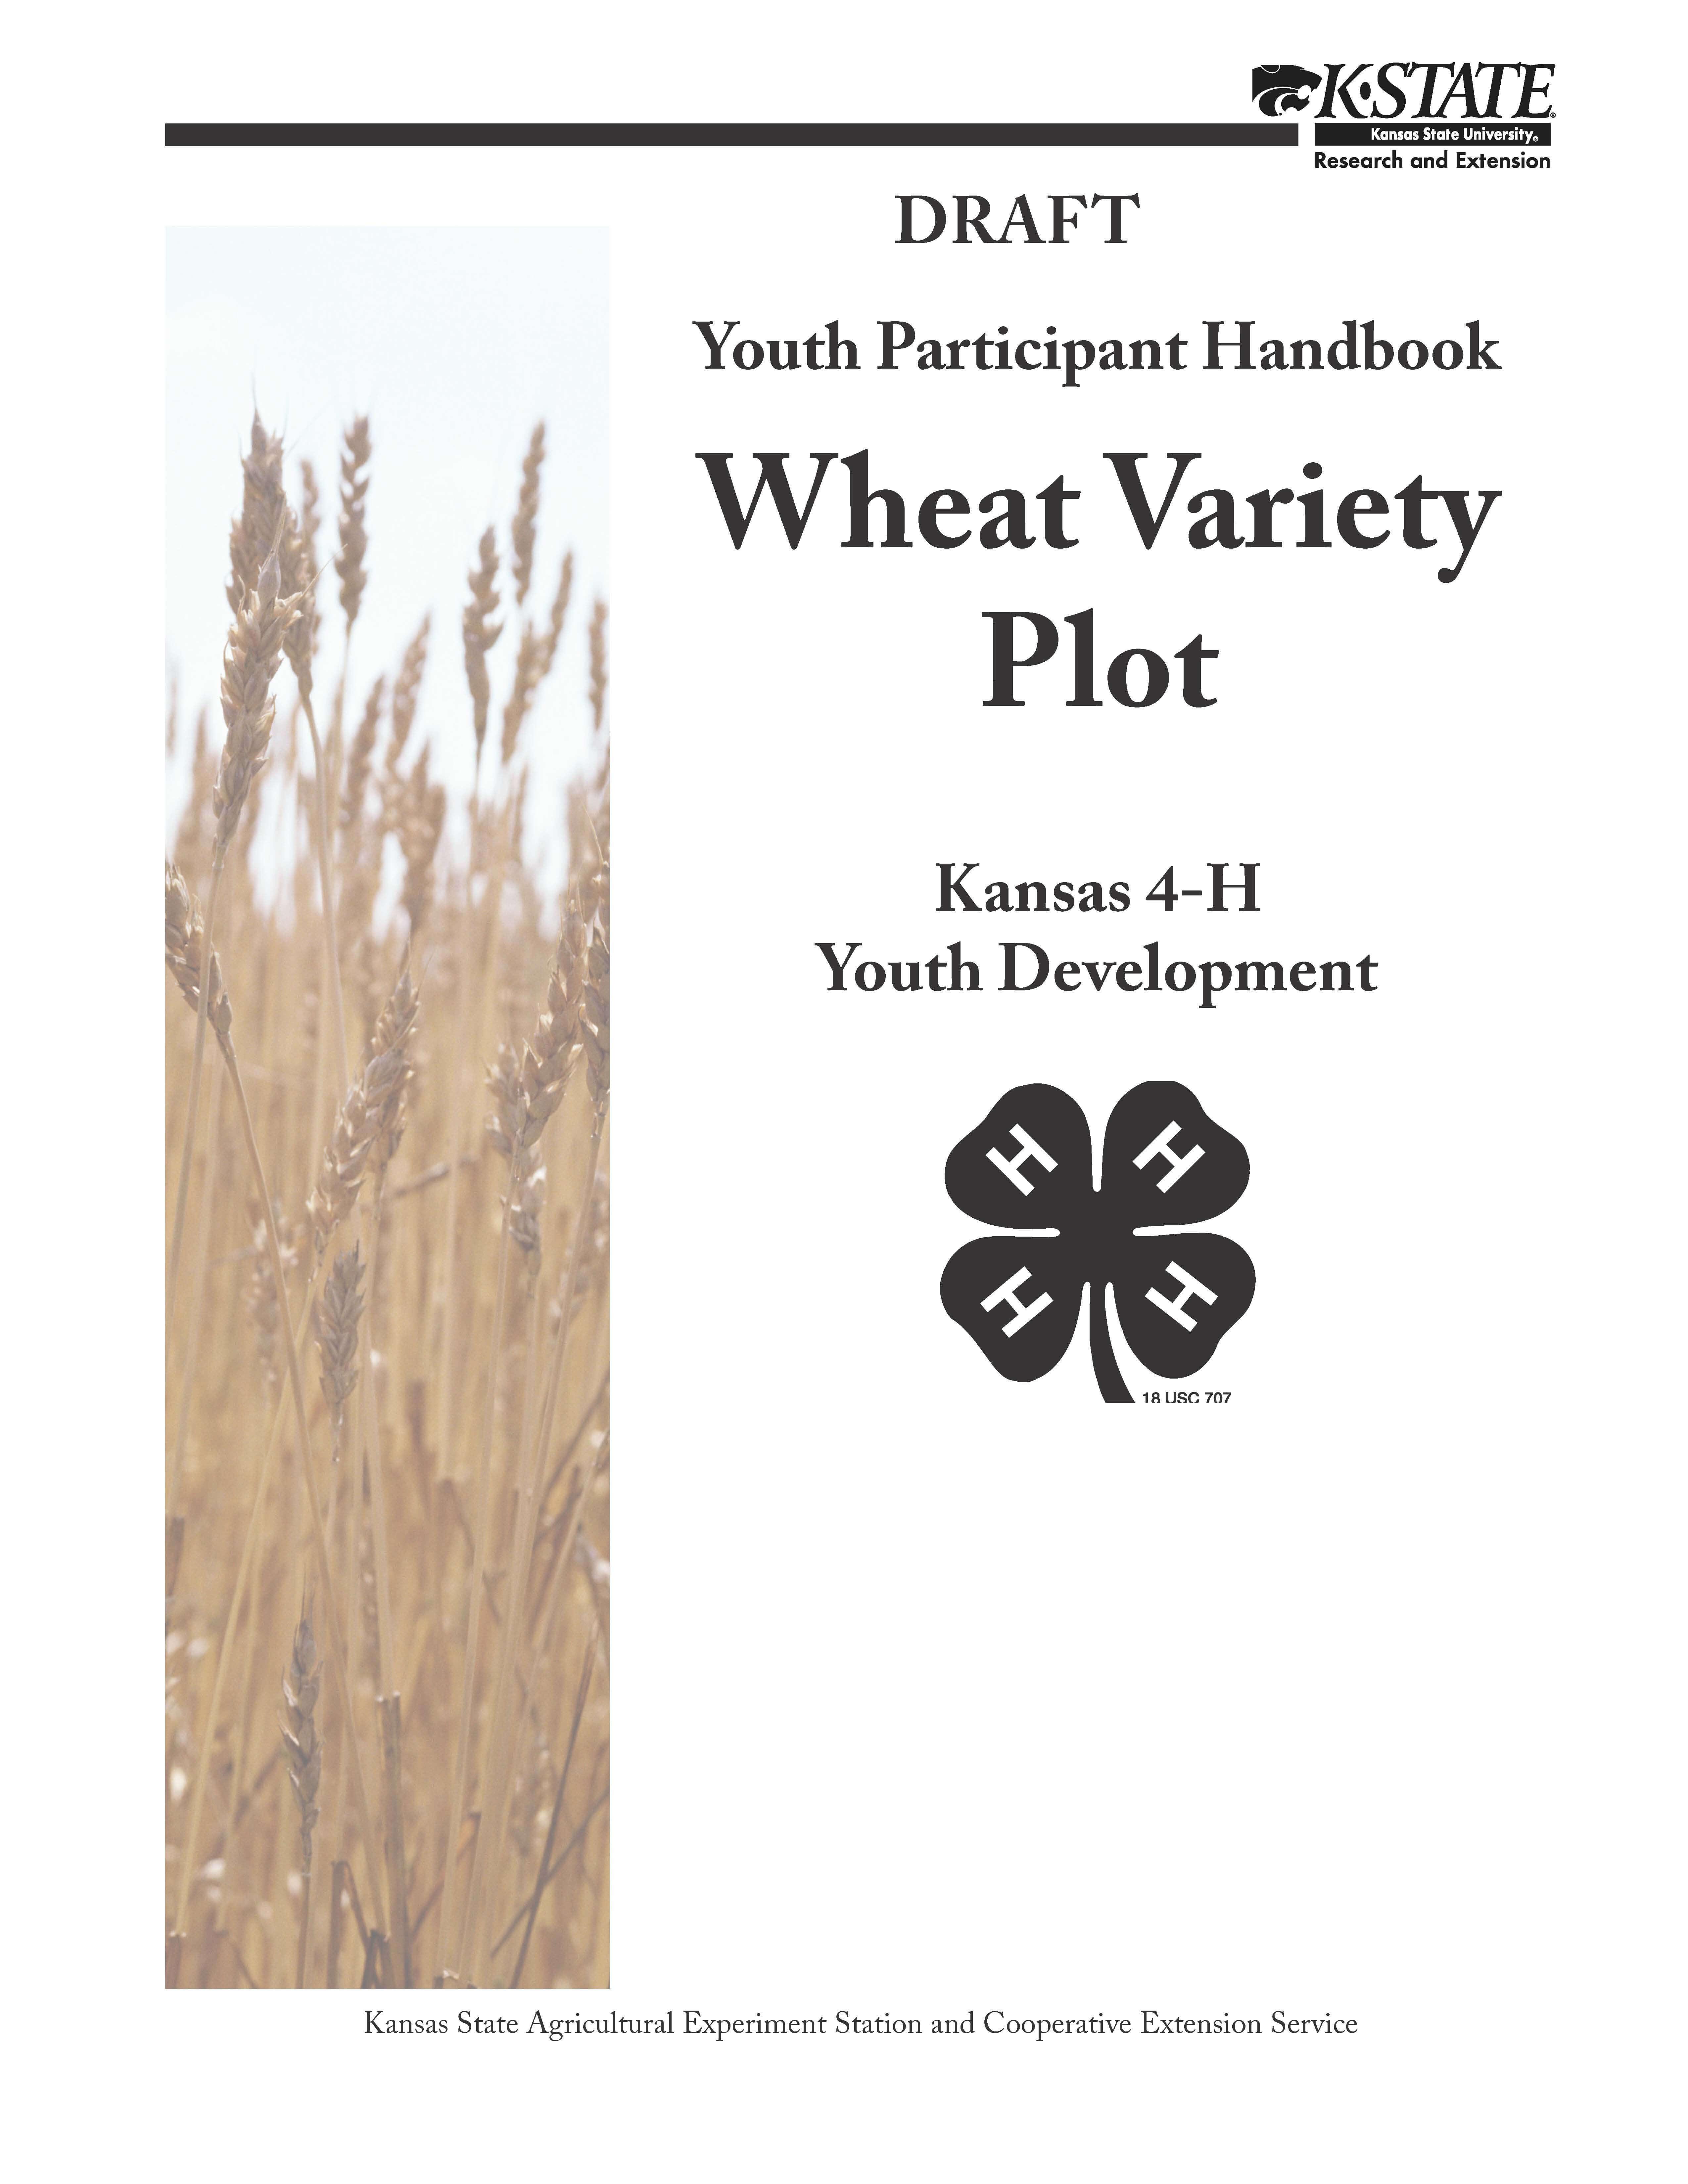 Wheat Variety Plot Photo